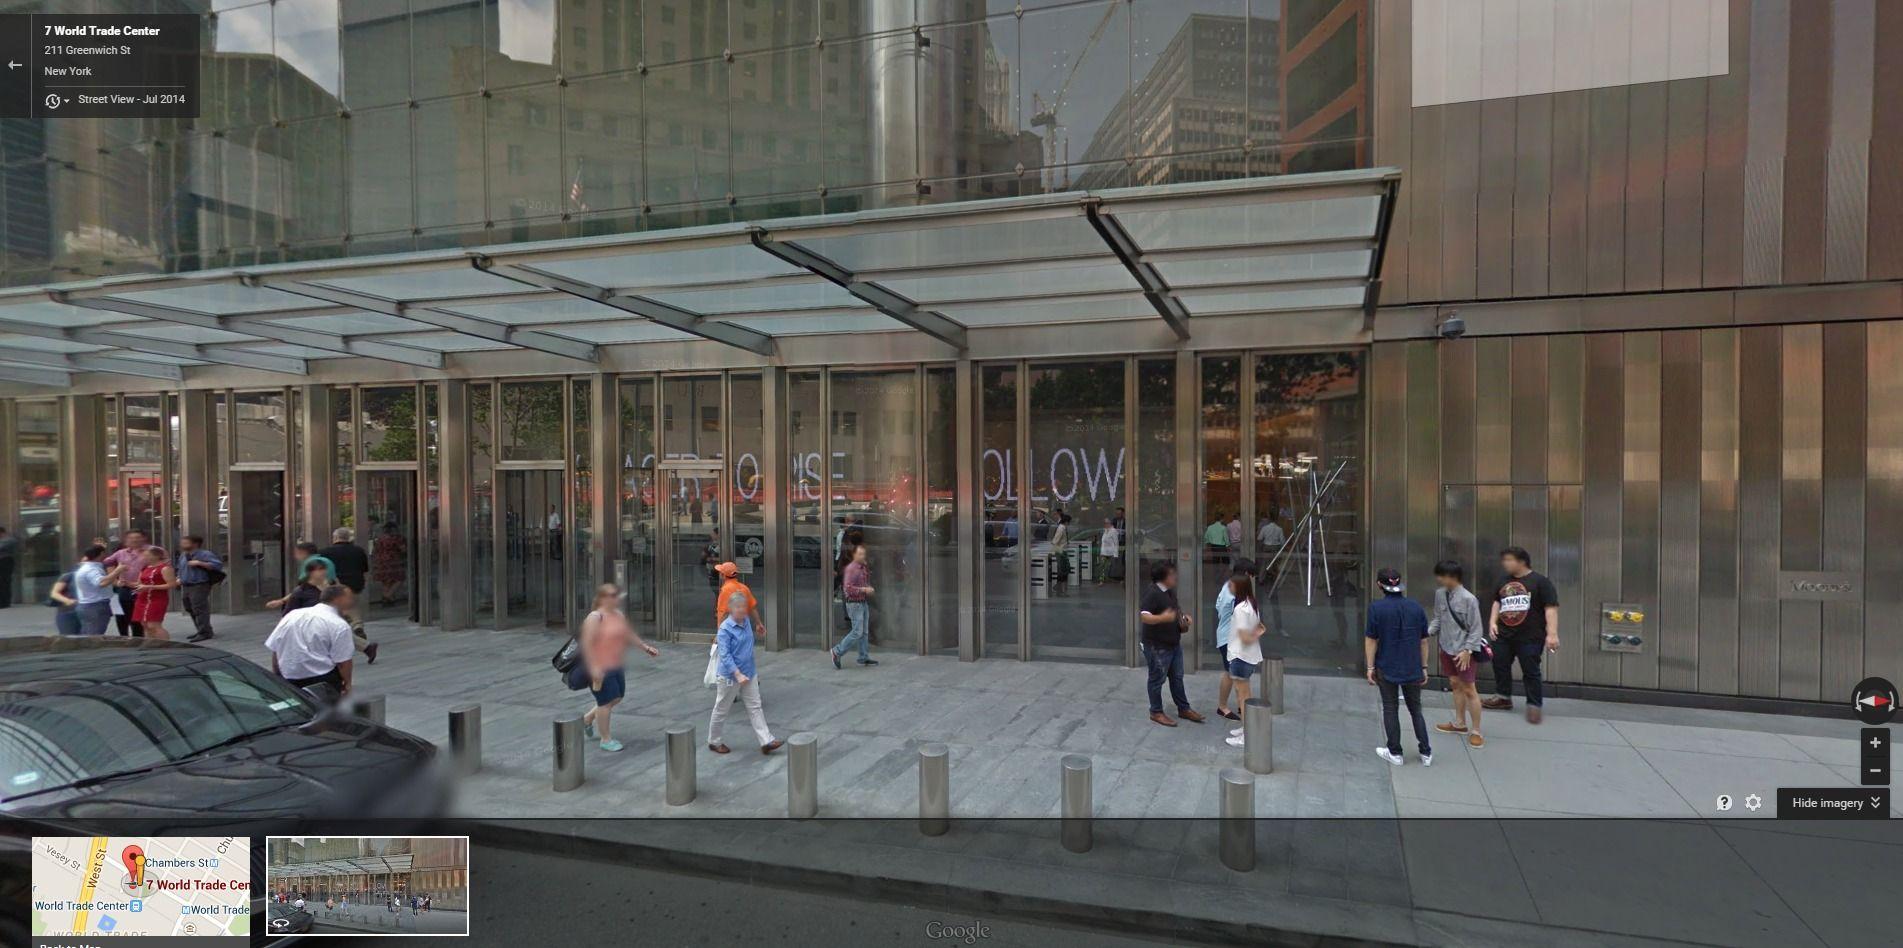 7 world trade center google maps nyas pinterest 7 world trade center google maps gumiabroncs Gallery